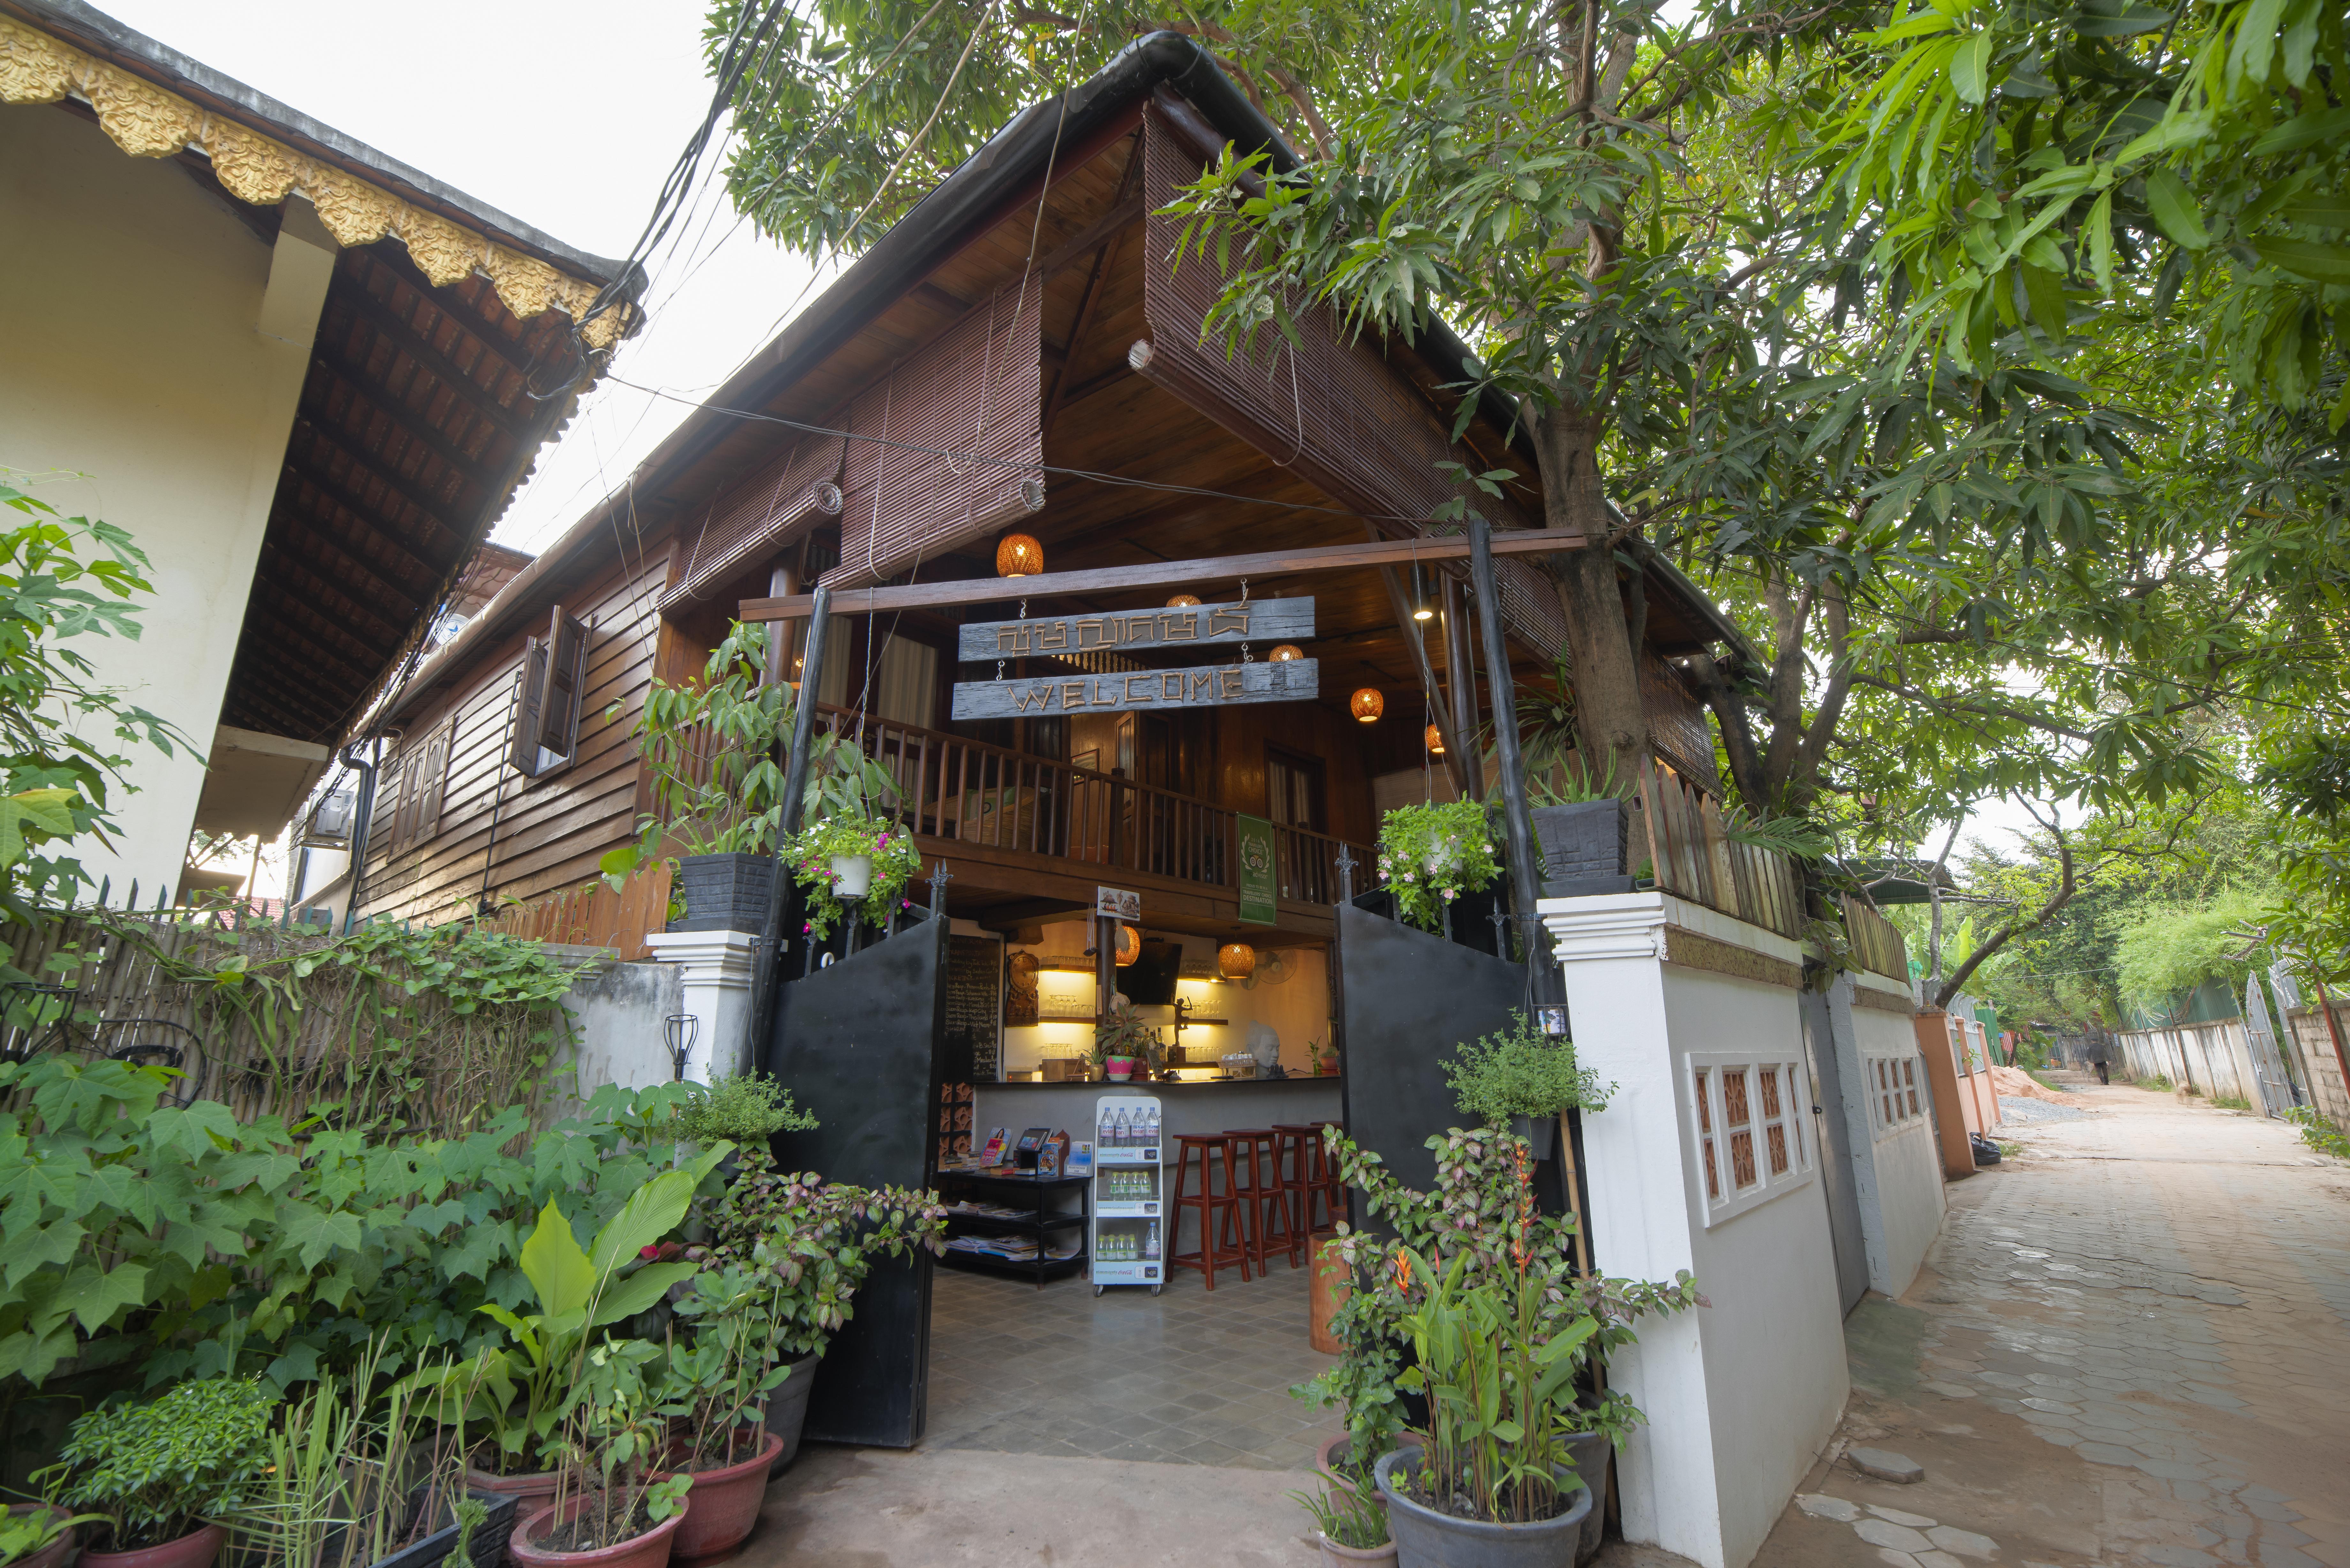 Maison Model D'Angkor